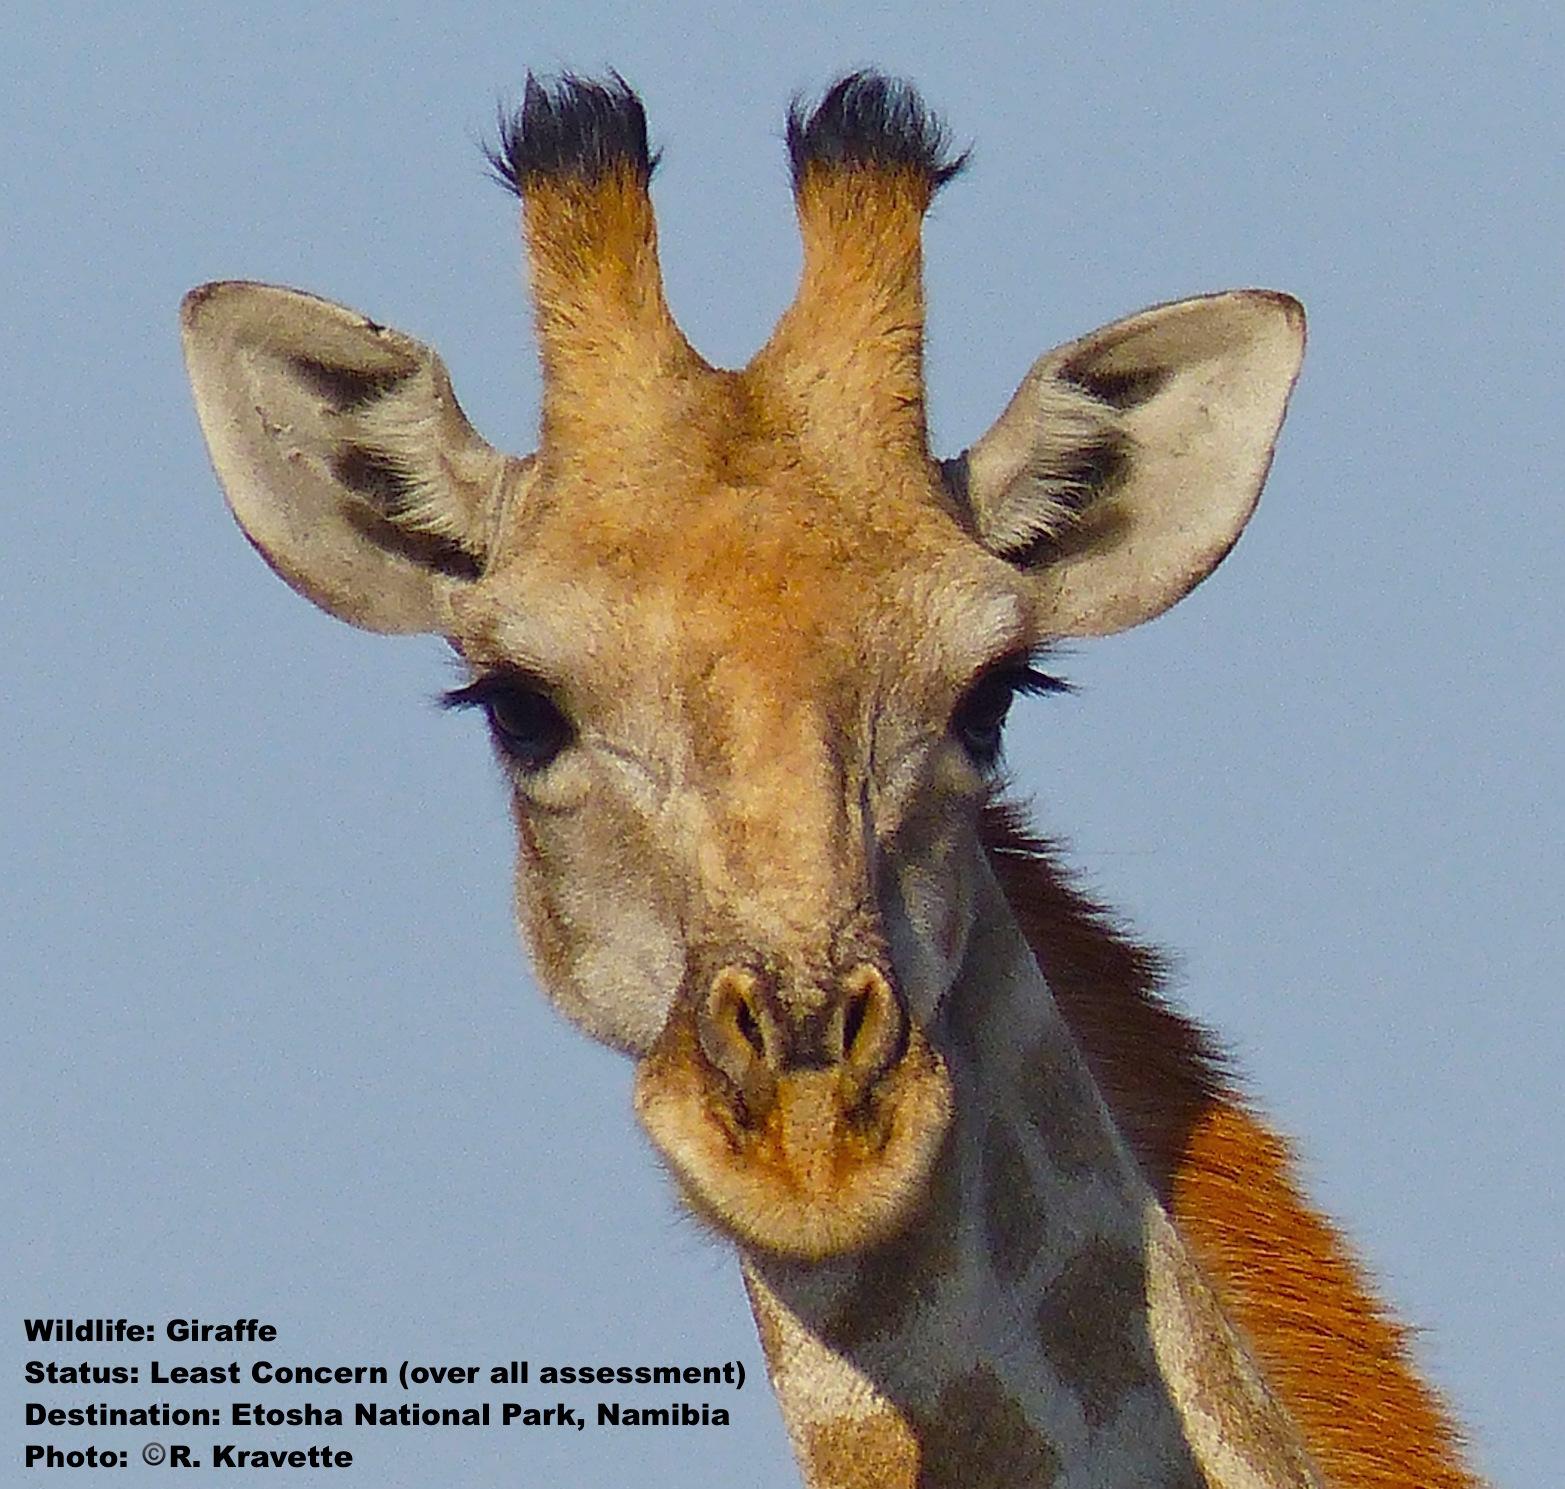 Giraffe_Etosha_Namibia.jpg